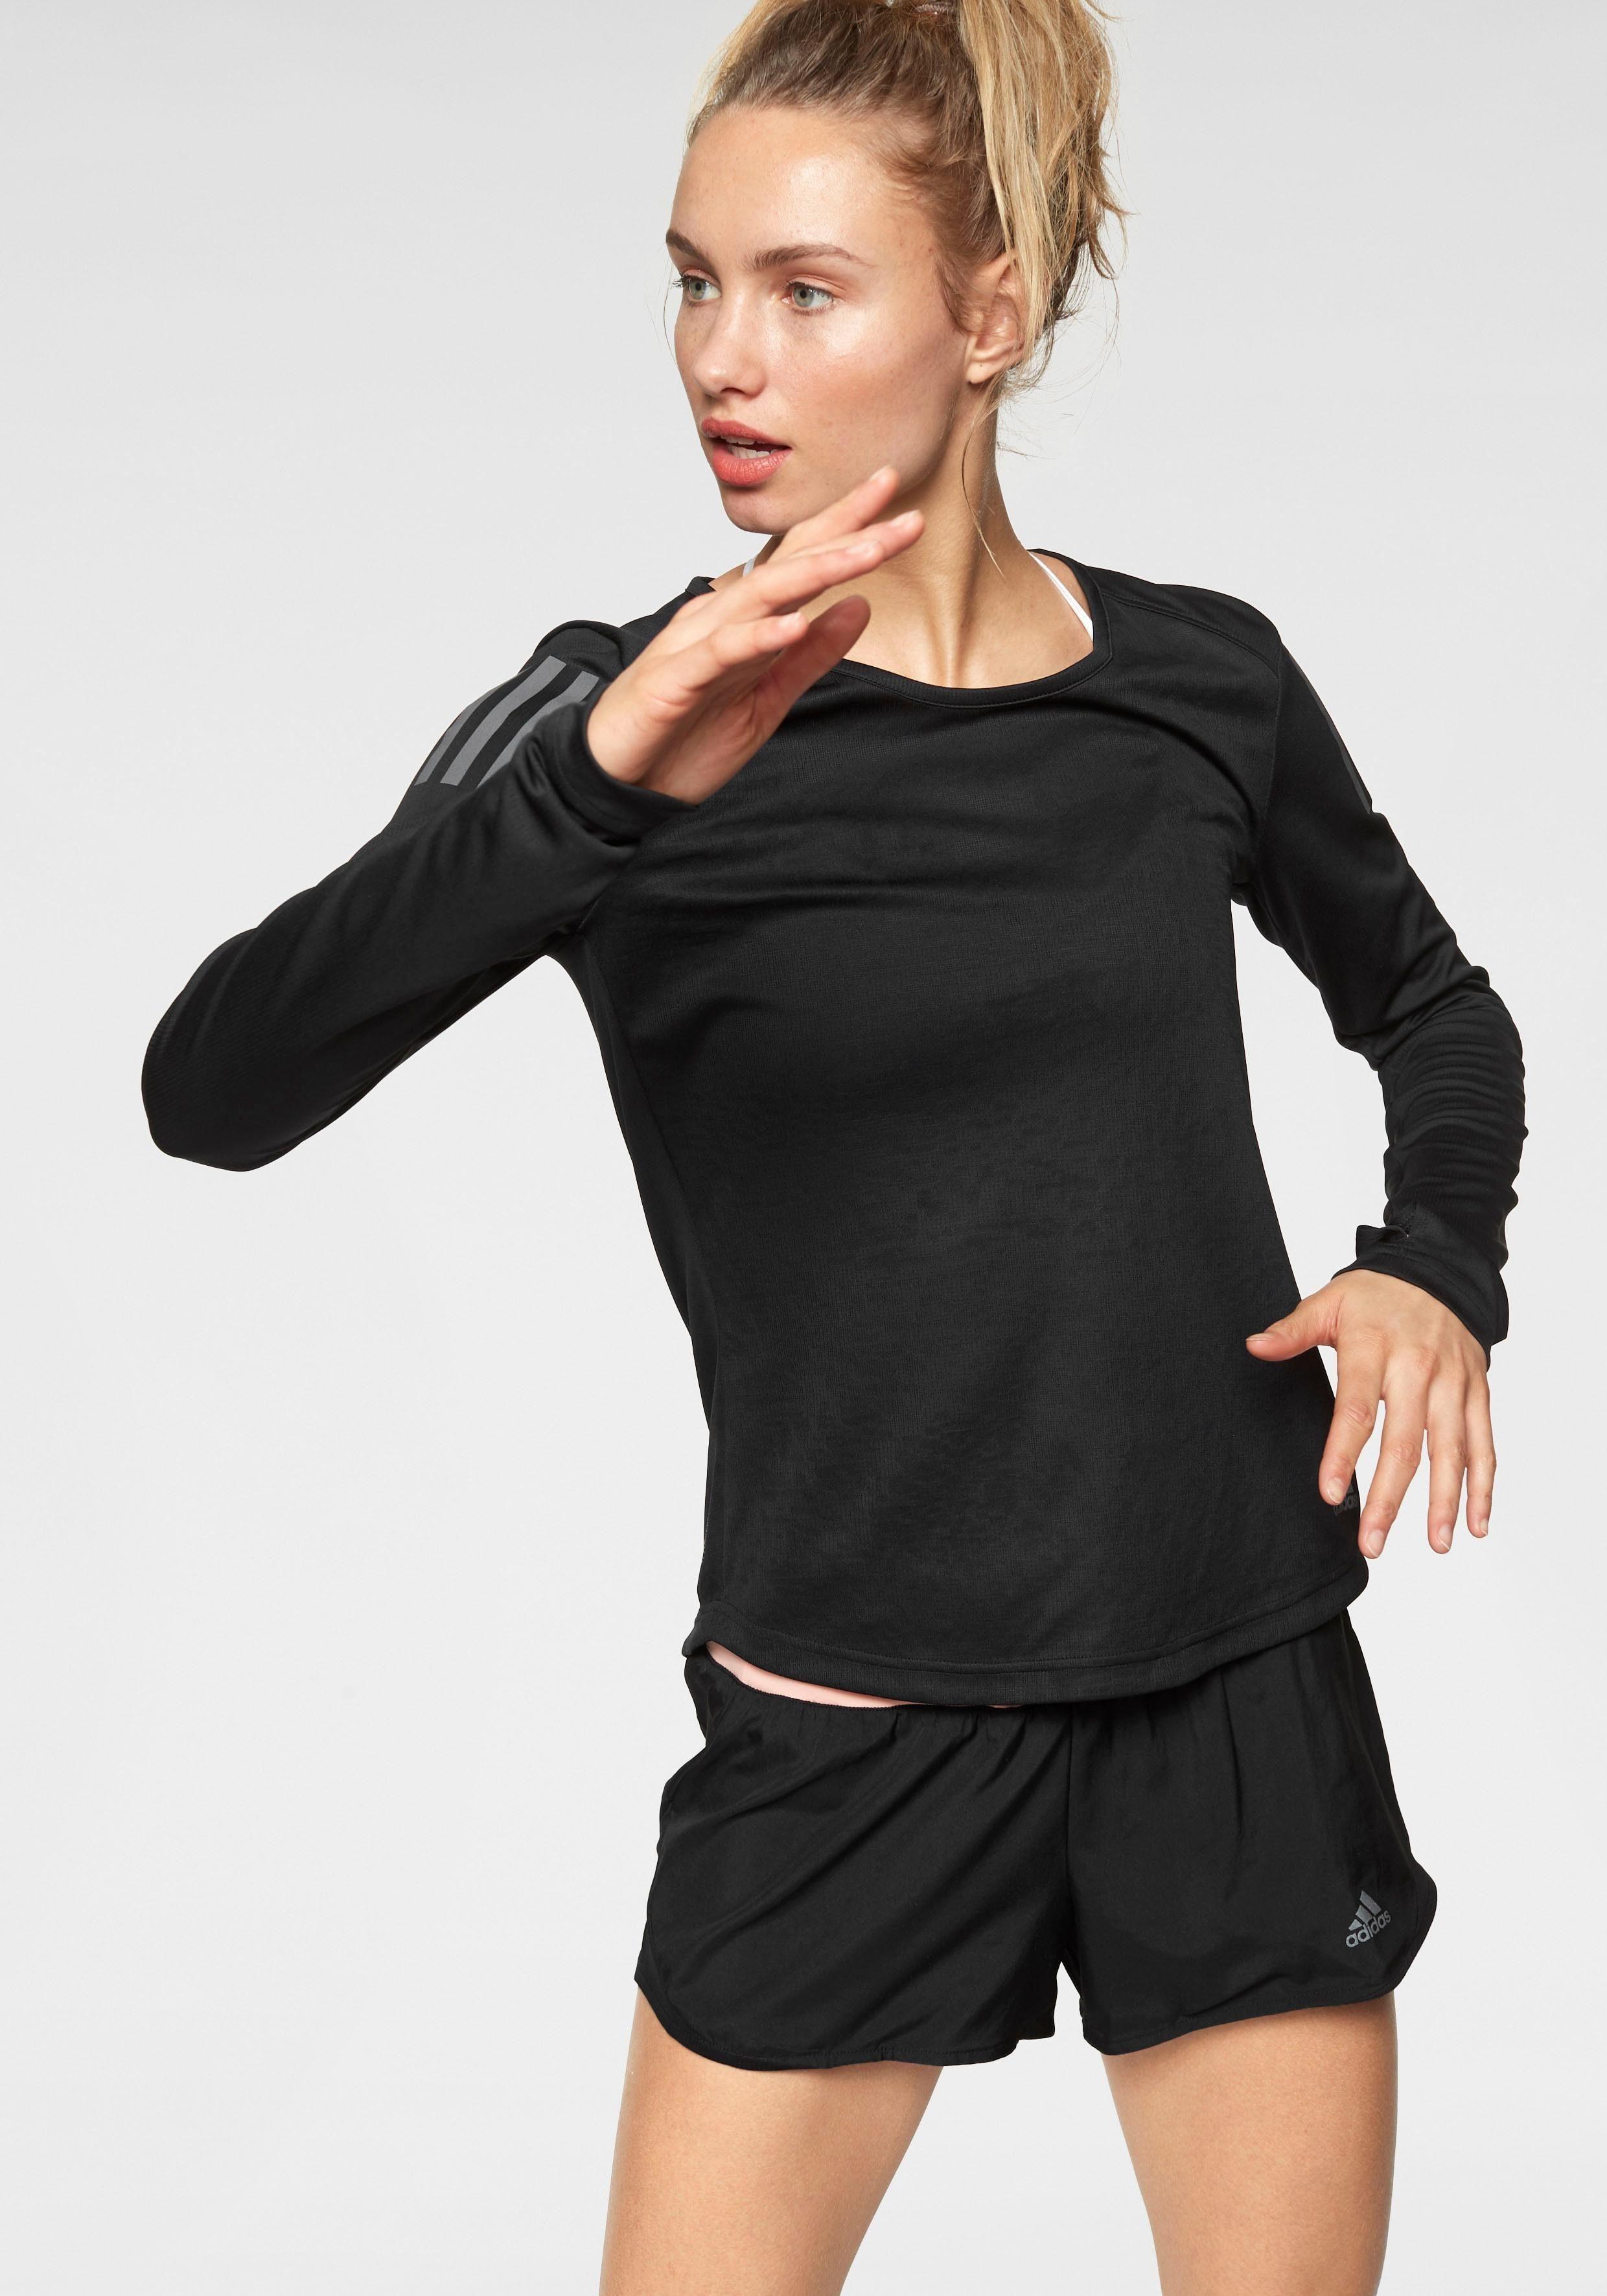 OTTO   Damen adidas Performance Laufshirt RUN LONGSLEEVE